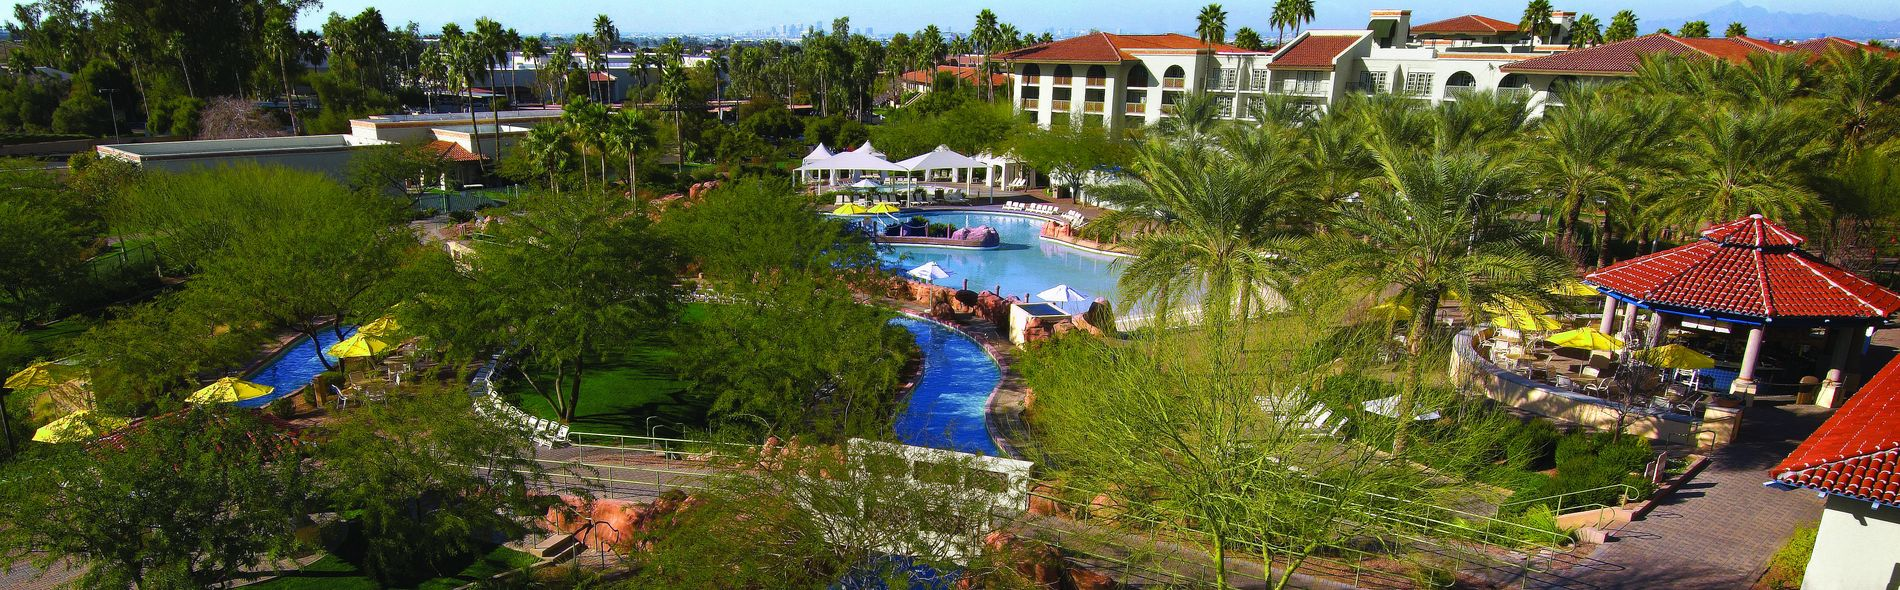 Best Kitchen Gallery: Luxury Phoenix Hotel Rooms Arizona Grand Resort Spa of Hotels And Resorts In Phoenix Az  on rachelxblog.com